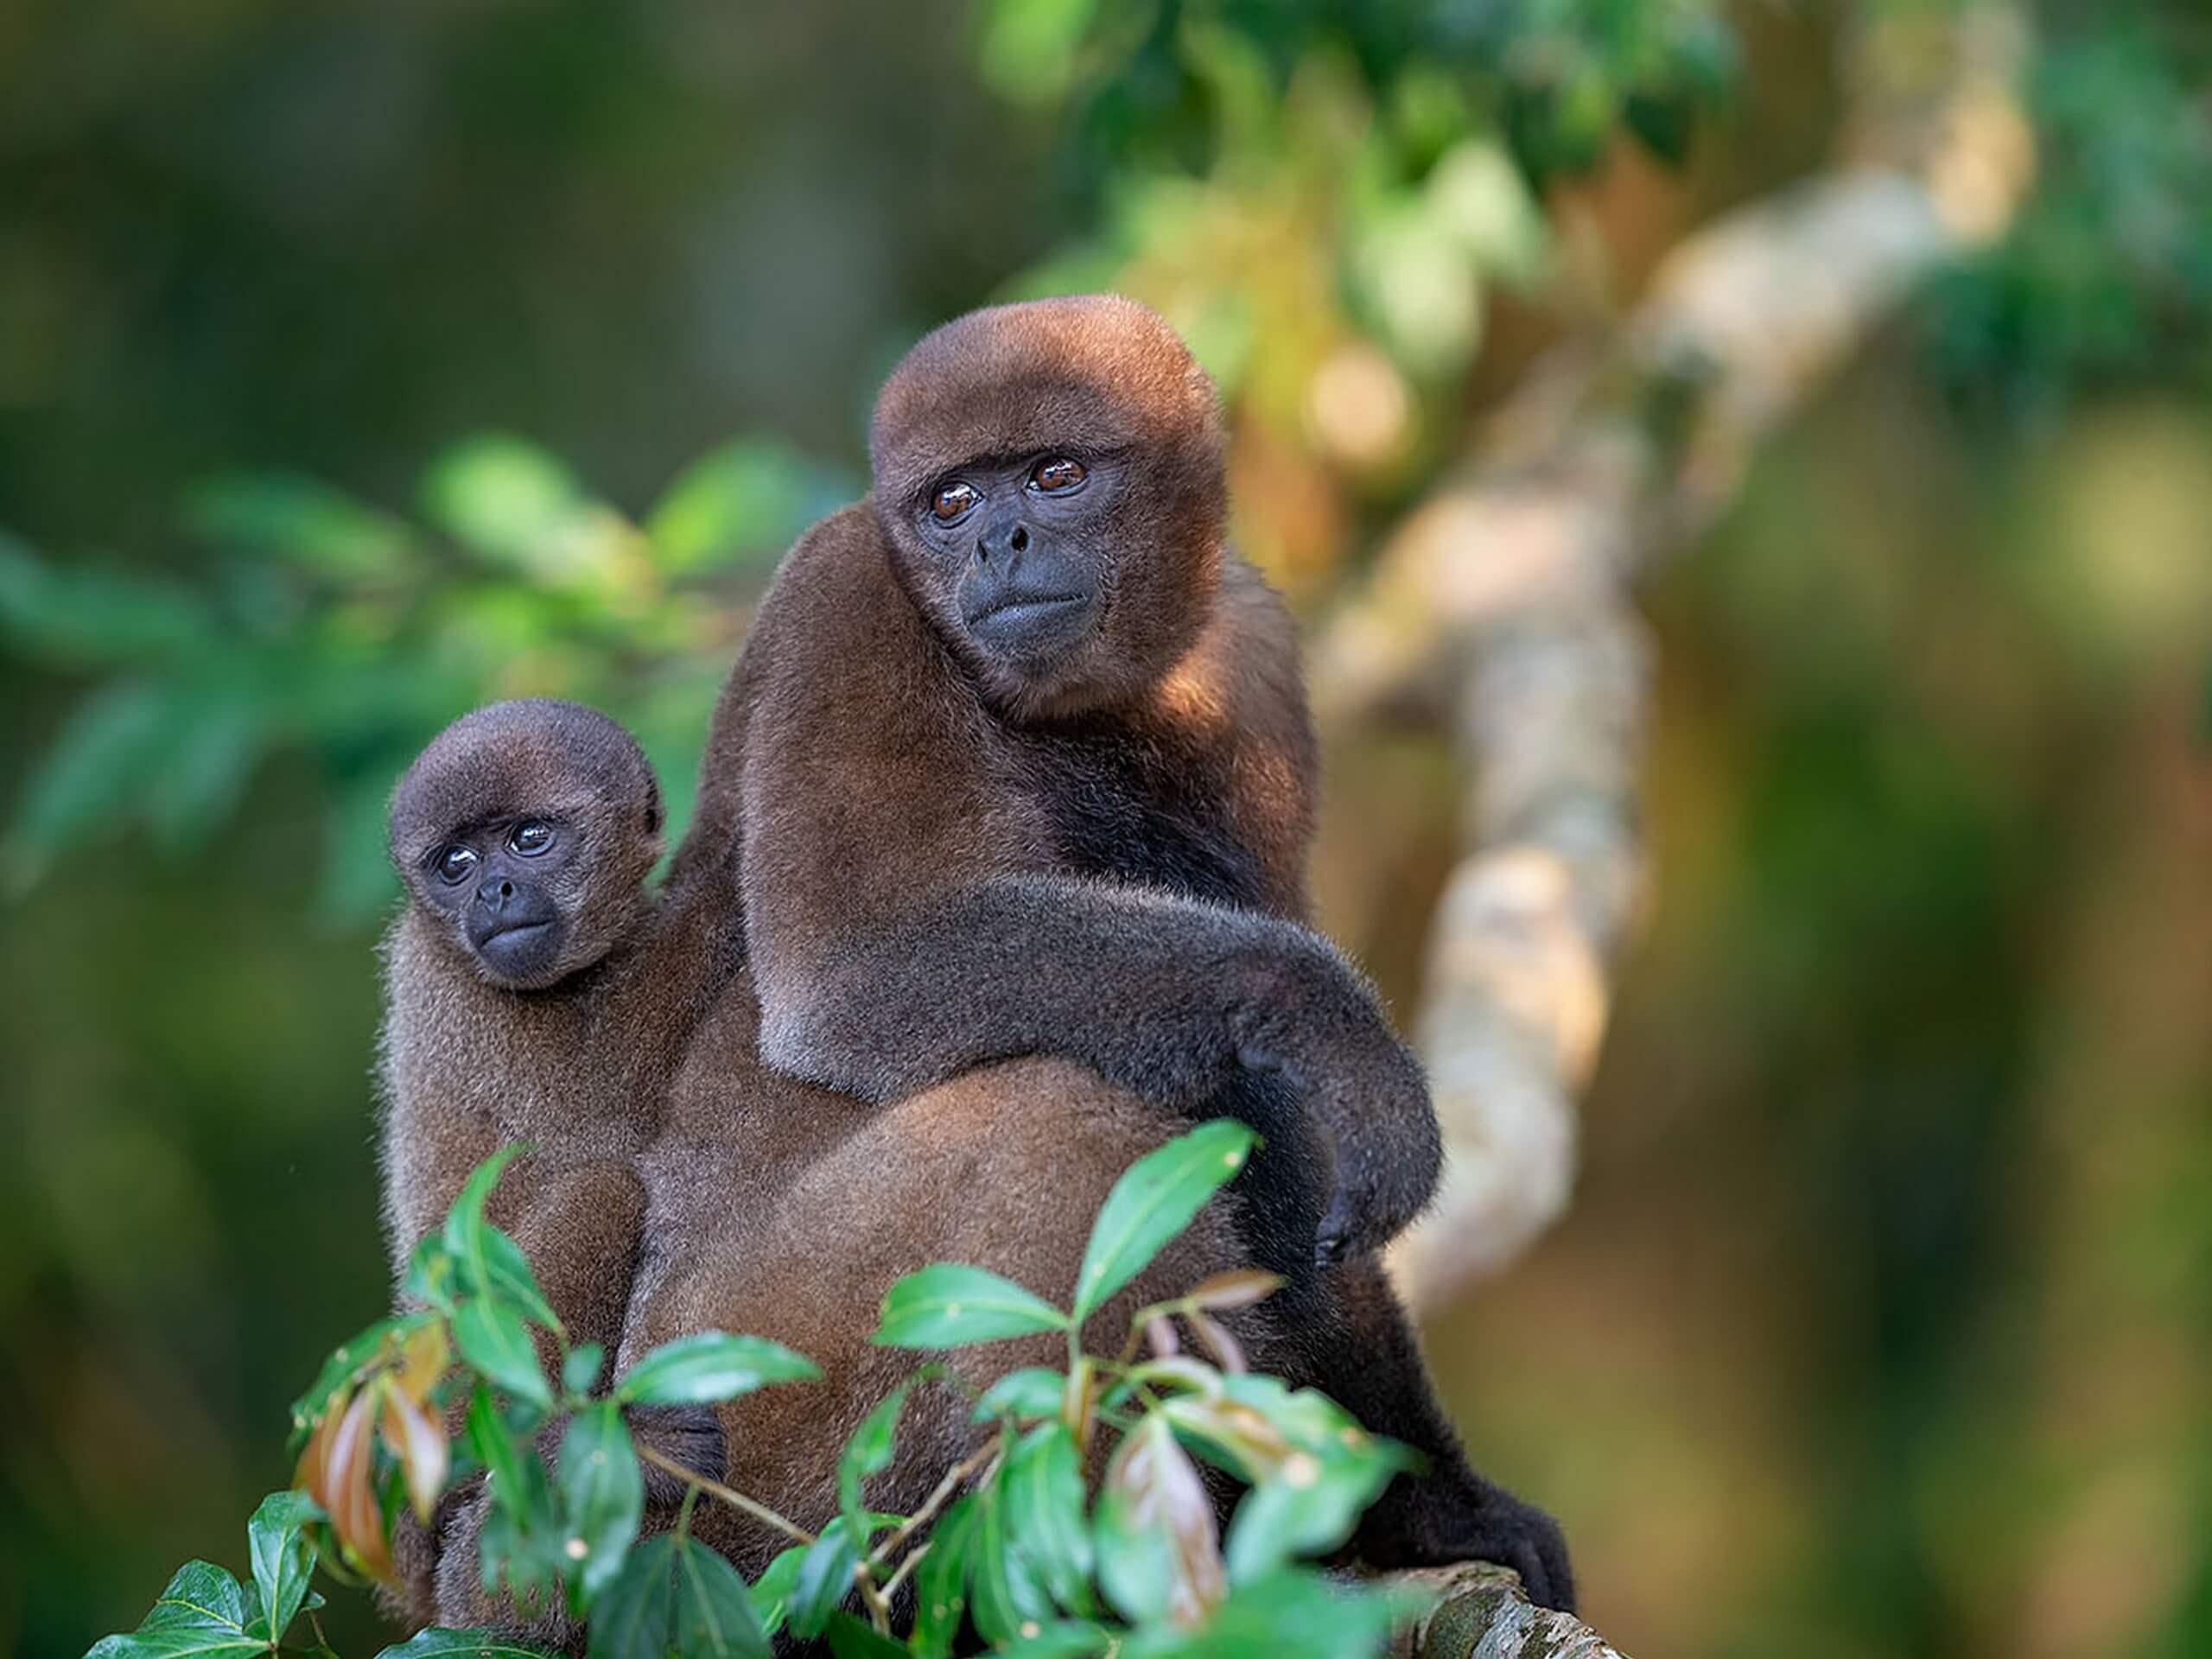 Monkeys seen while on biking tour in Ecuador rainforest